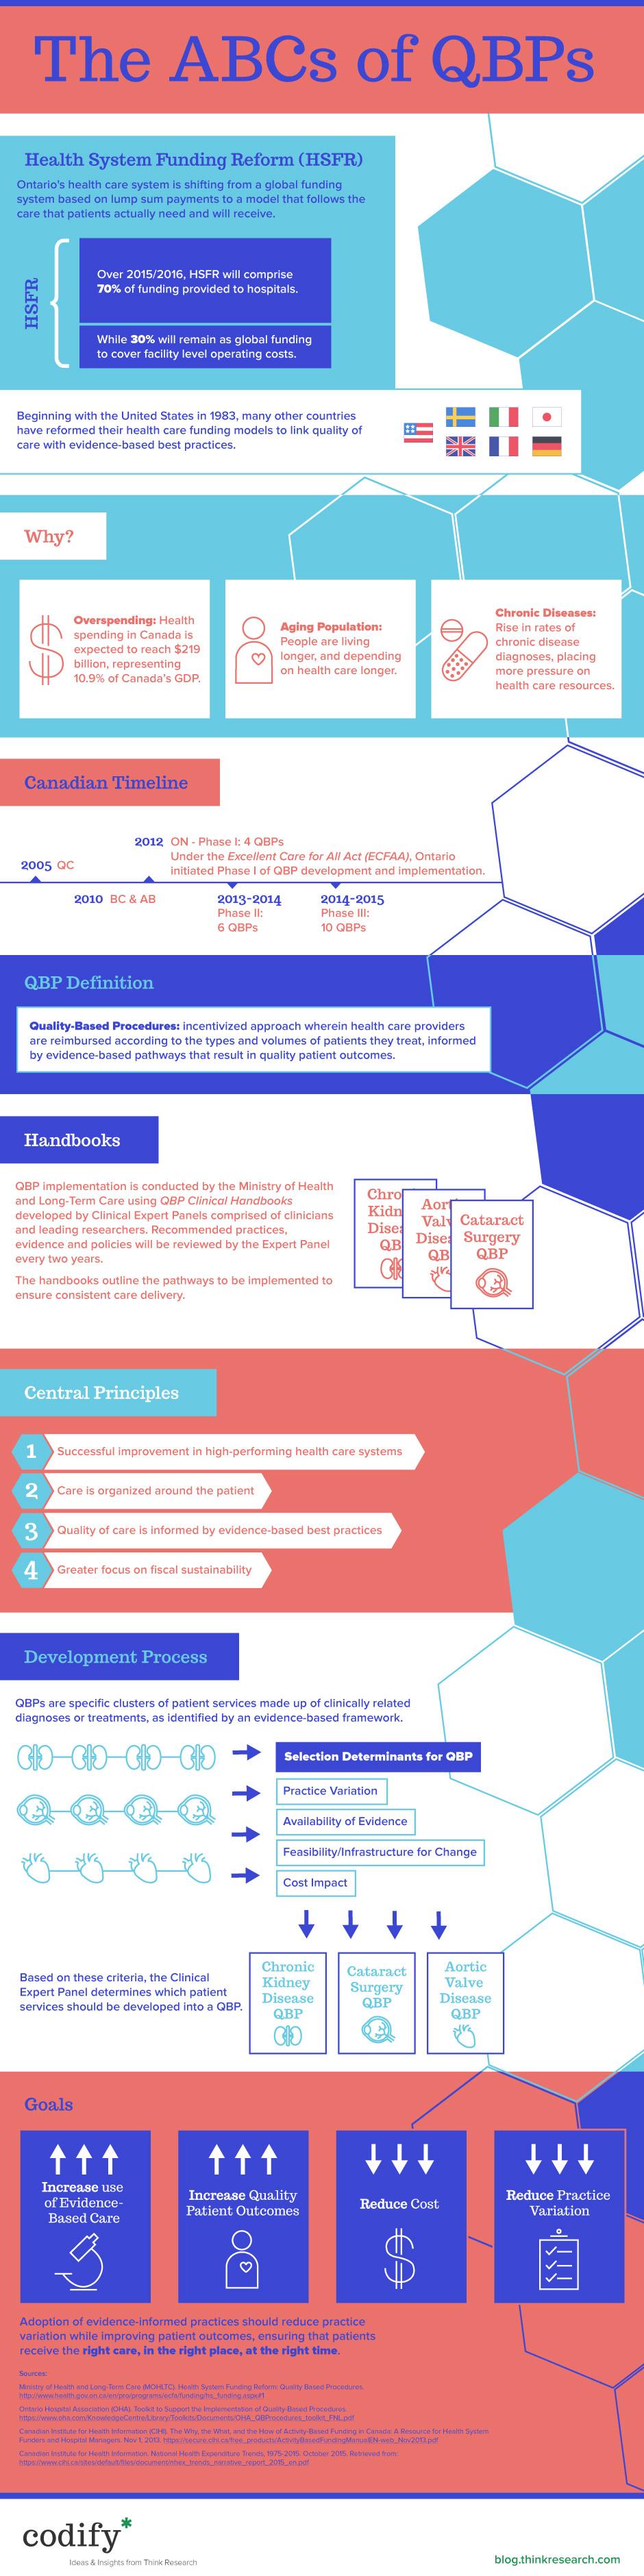 ABCs of QBPs infographic